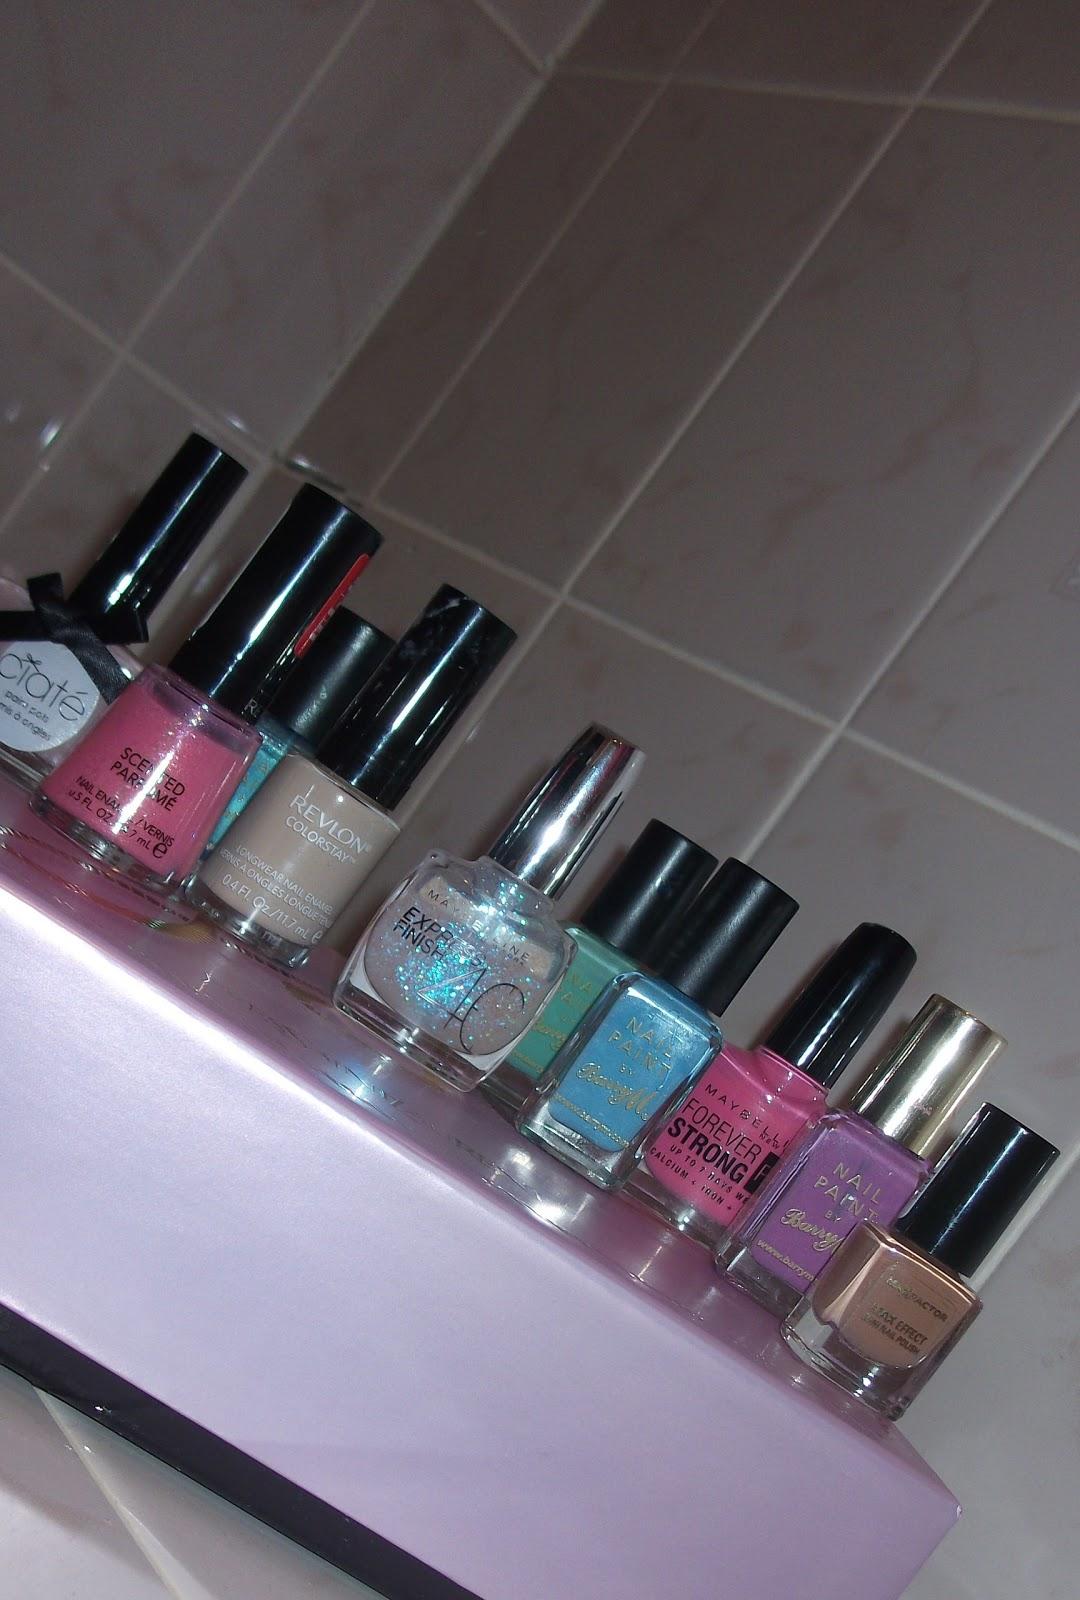 http://1.bp.blogspot.com/-reZImn8NgKY/T-X933m2aAI/AAAAAAAAADA/_464pJohtsM/s1600/Edited+version+of+TOP+10+summer+nail+colours+2..jpg